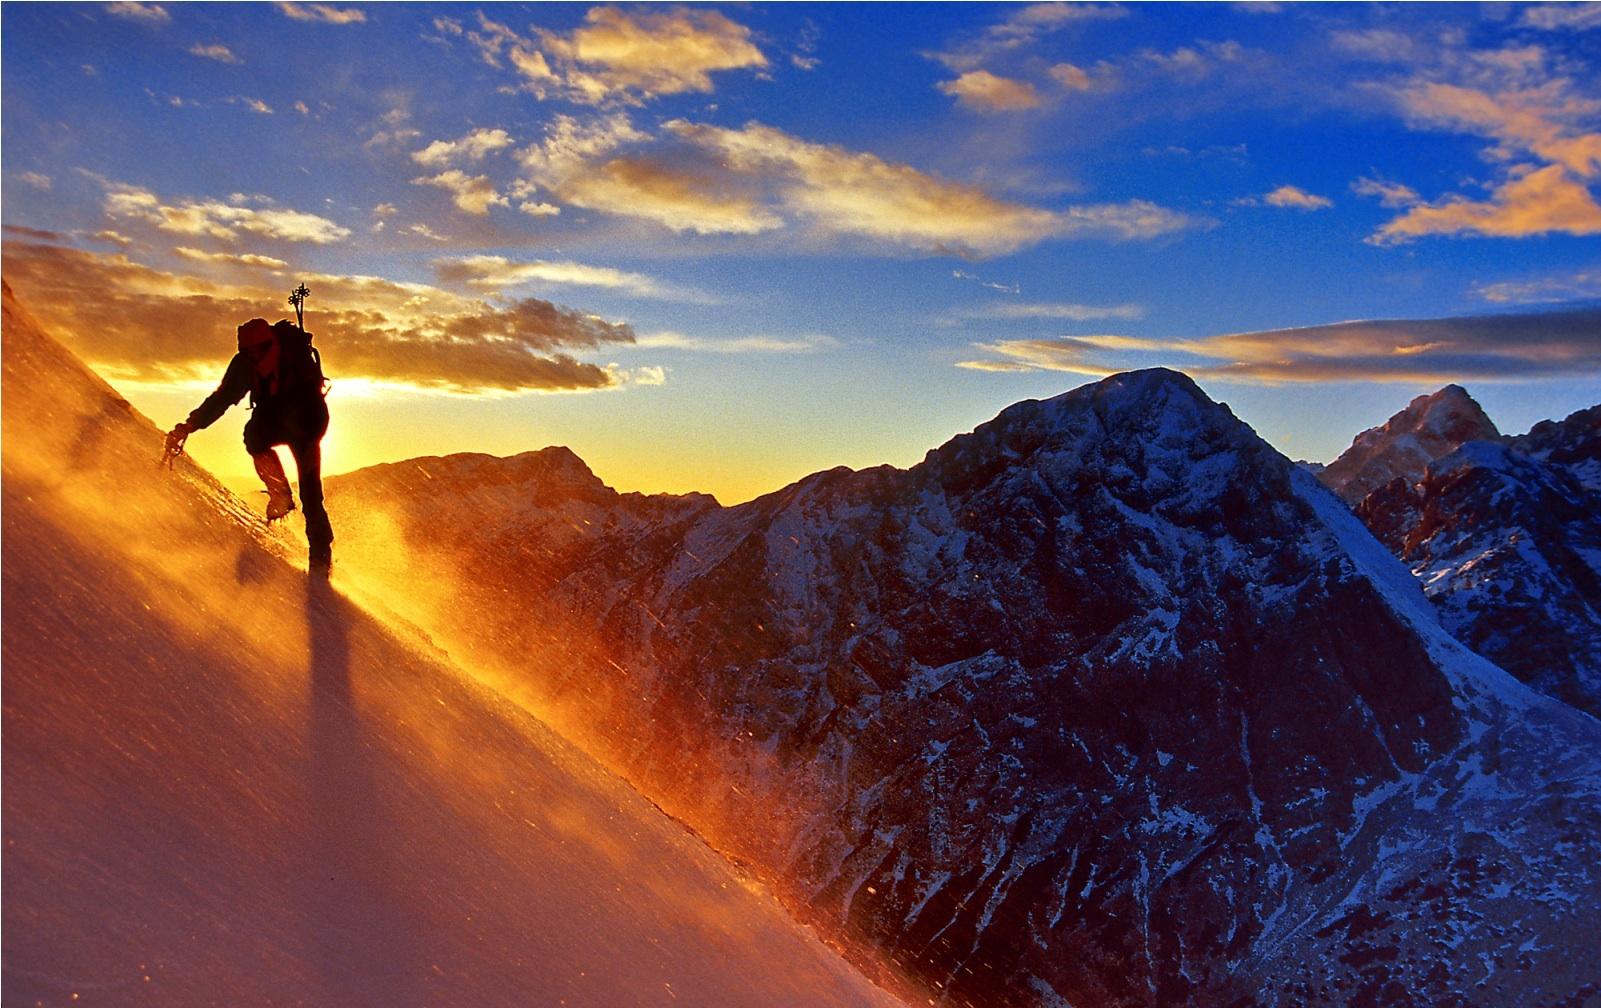 ... Gear 2013 uk and ireland banff mountain festival, 25 january to 13